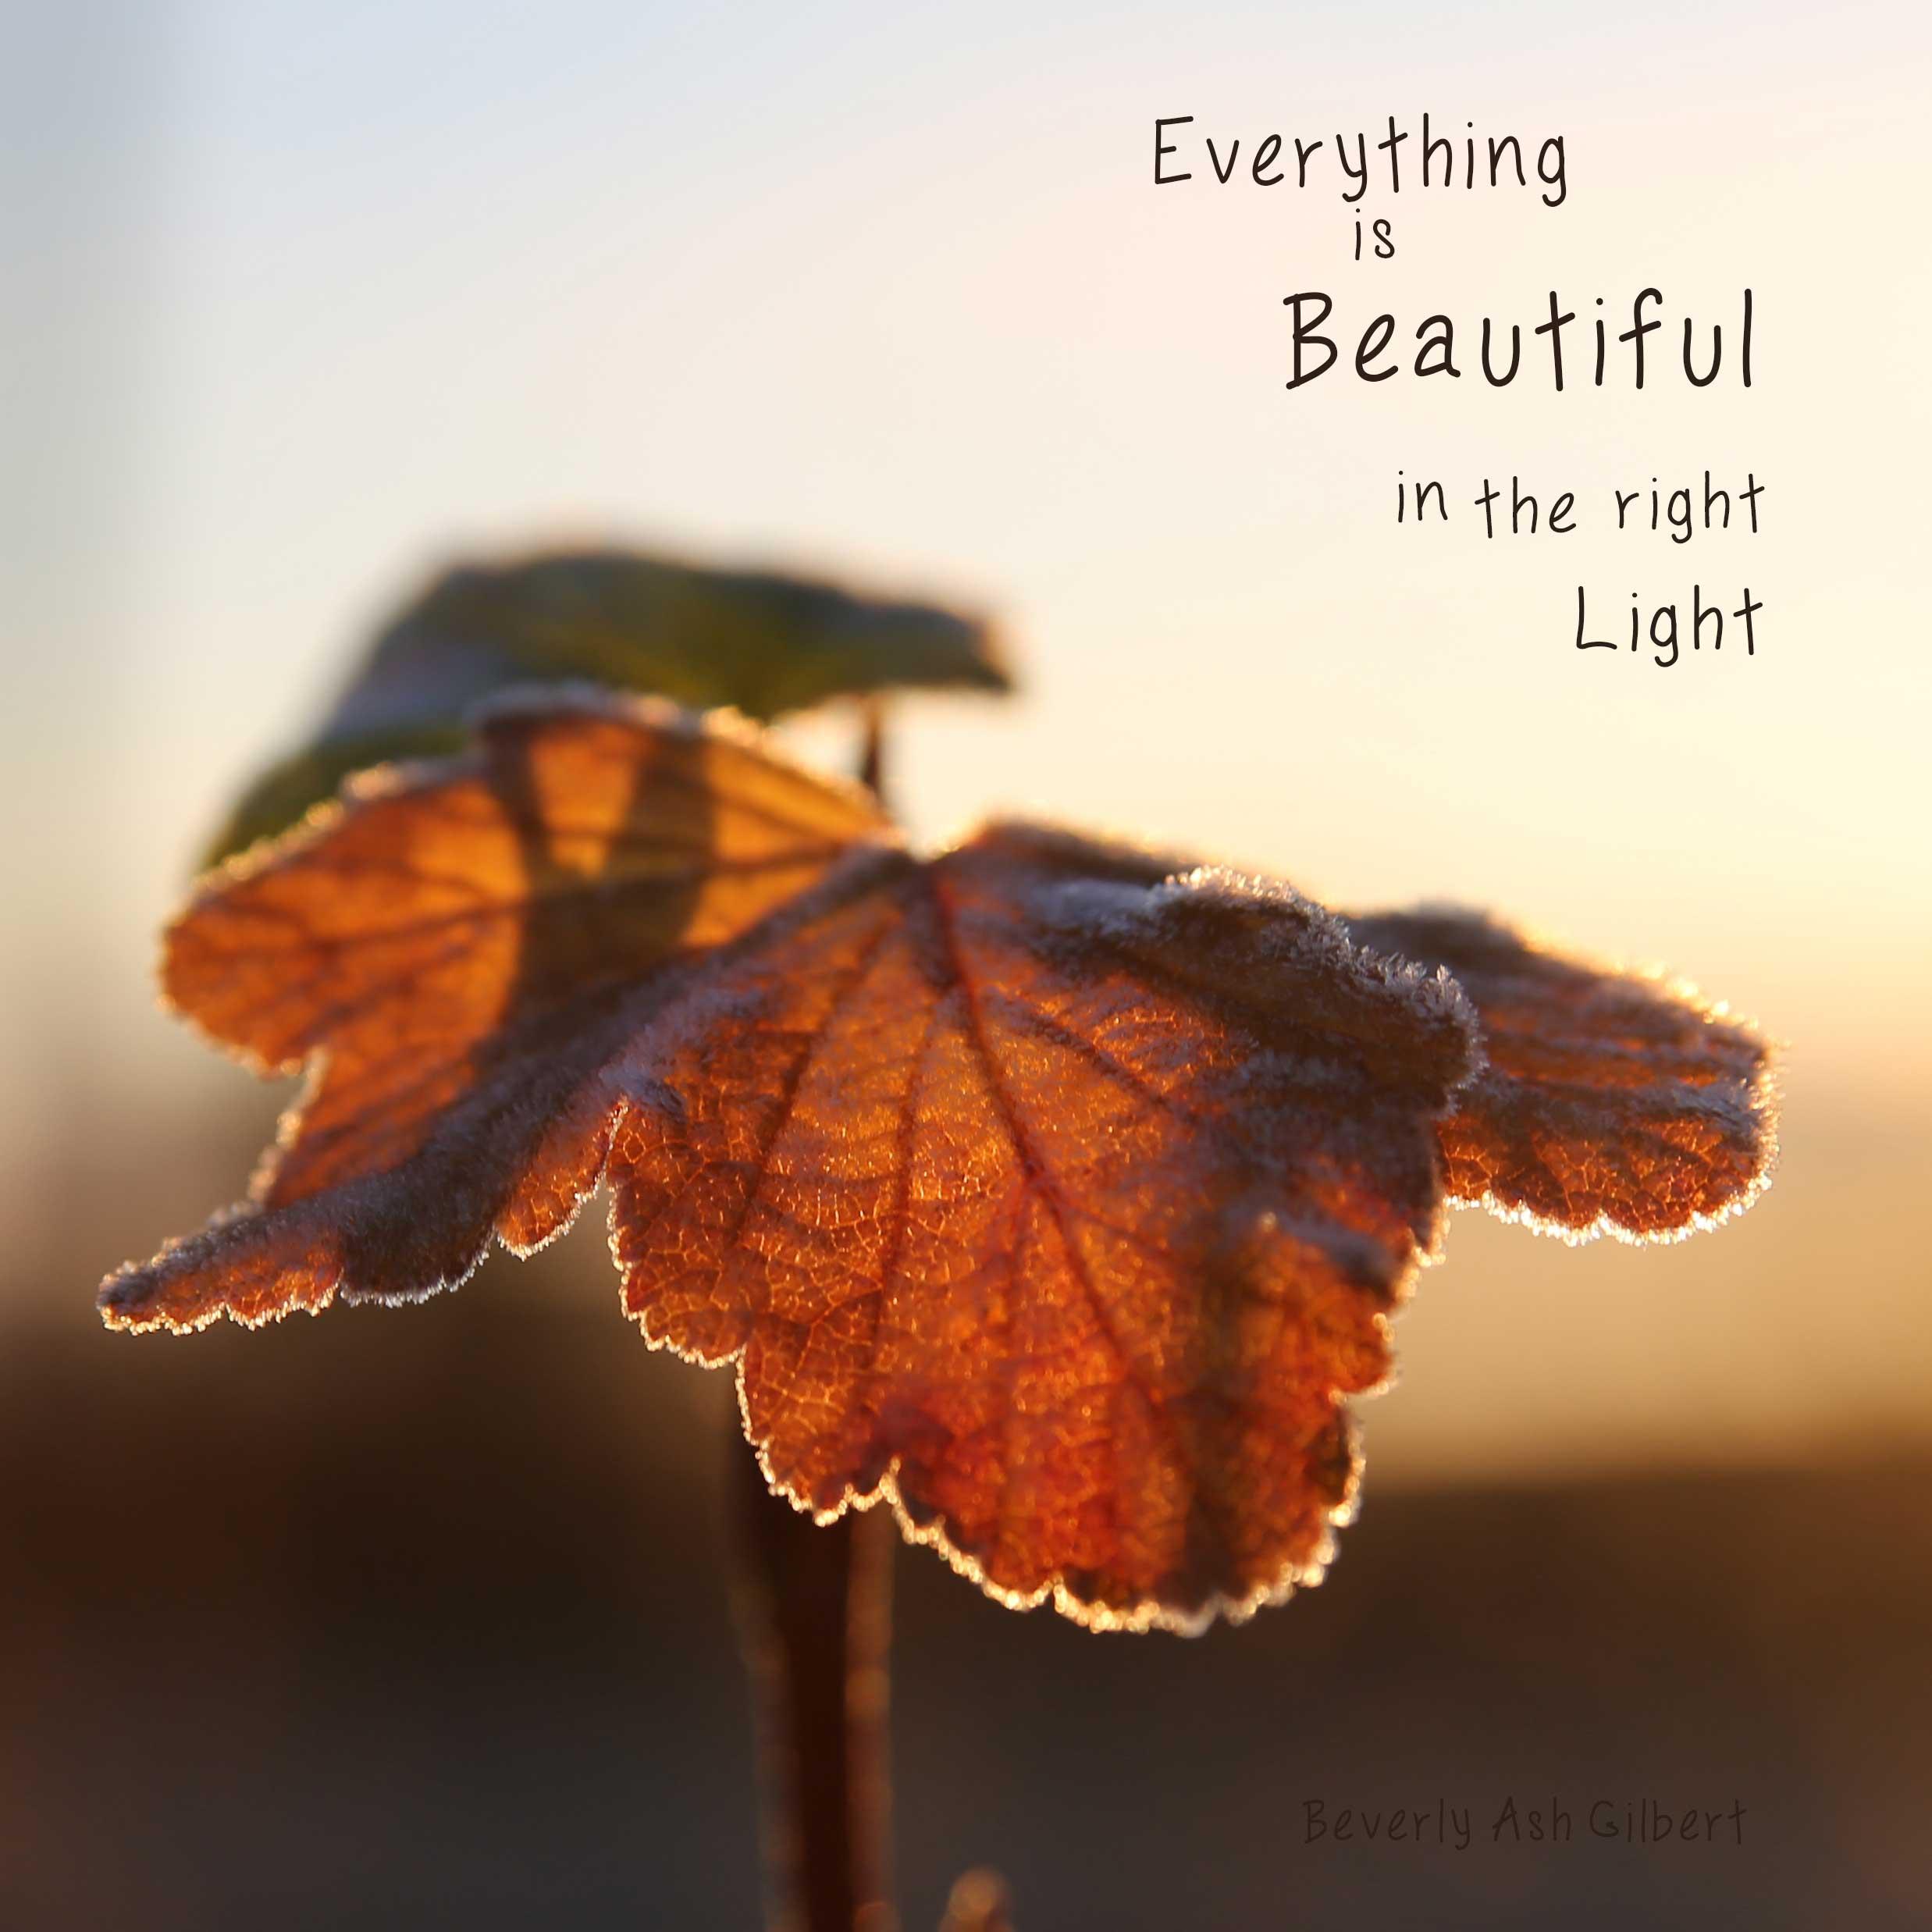 Positive_Inspiration_BeautyRightLight.jpg